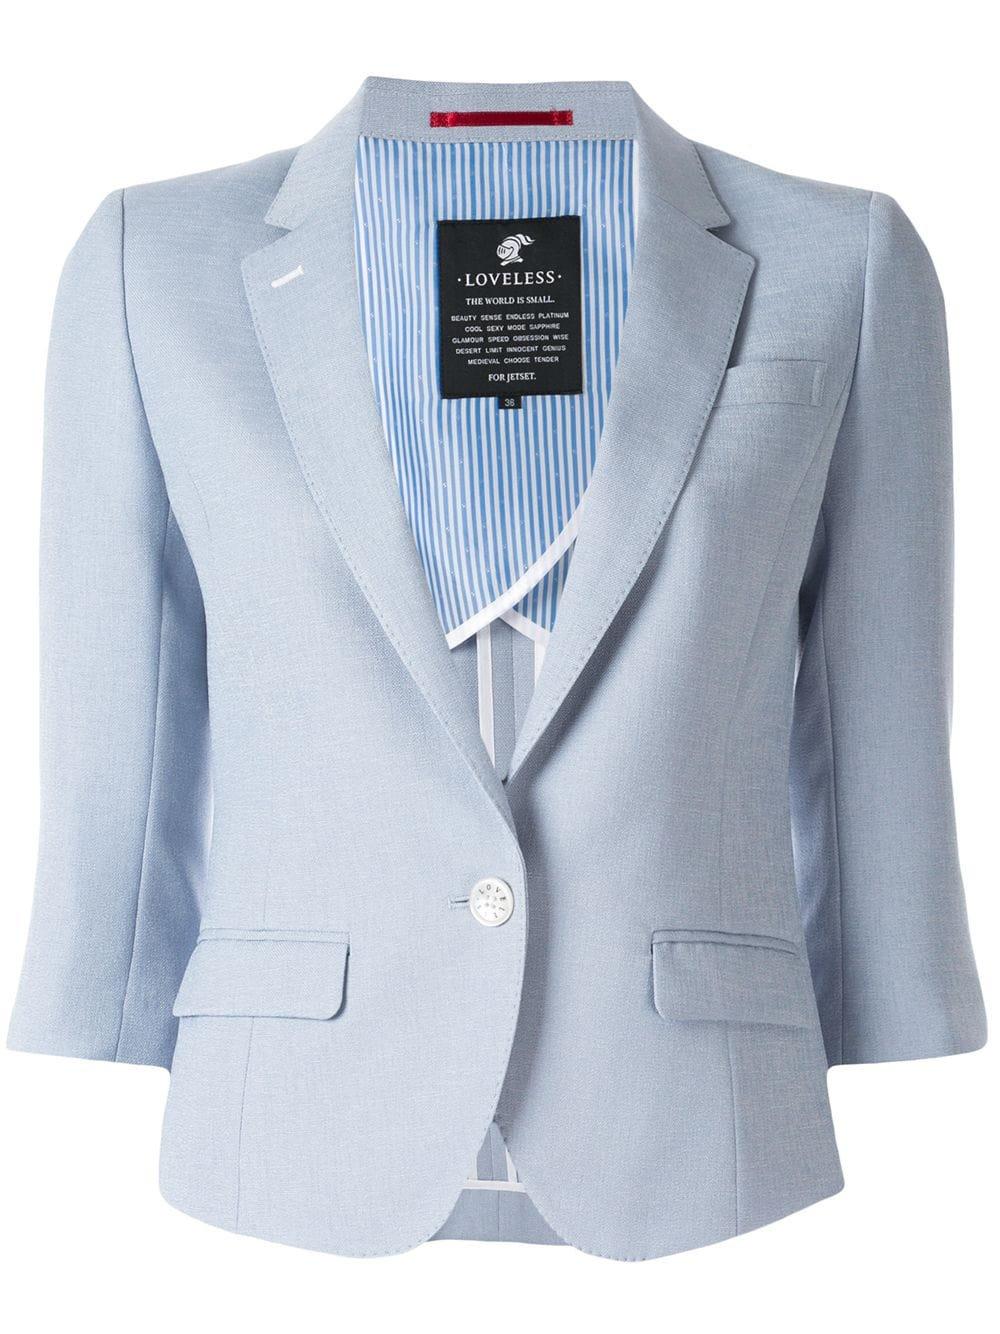 Loveless 3/4 sleeve blazer $298 - Buy Online SS19 - Quick Shipping, Price